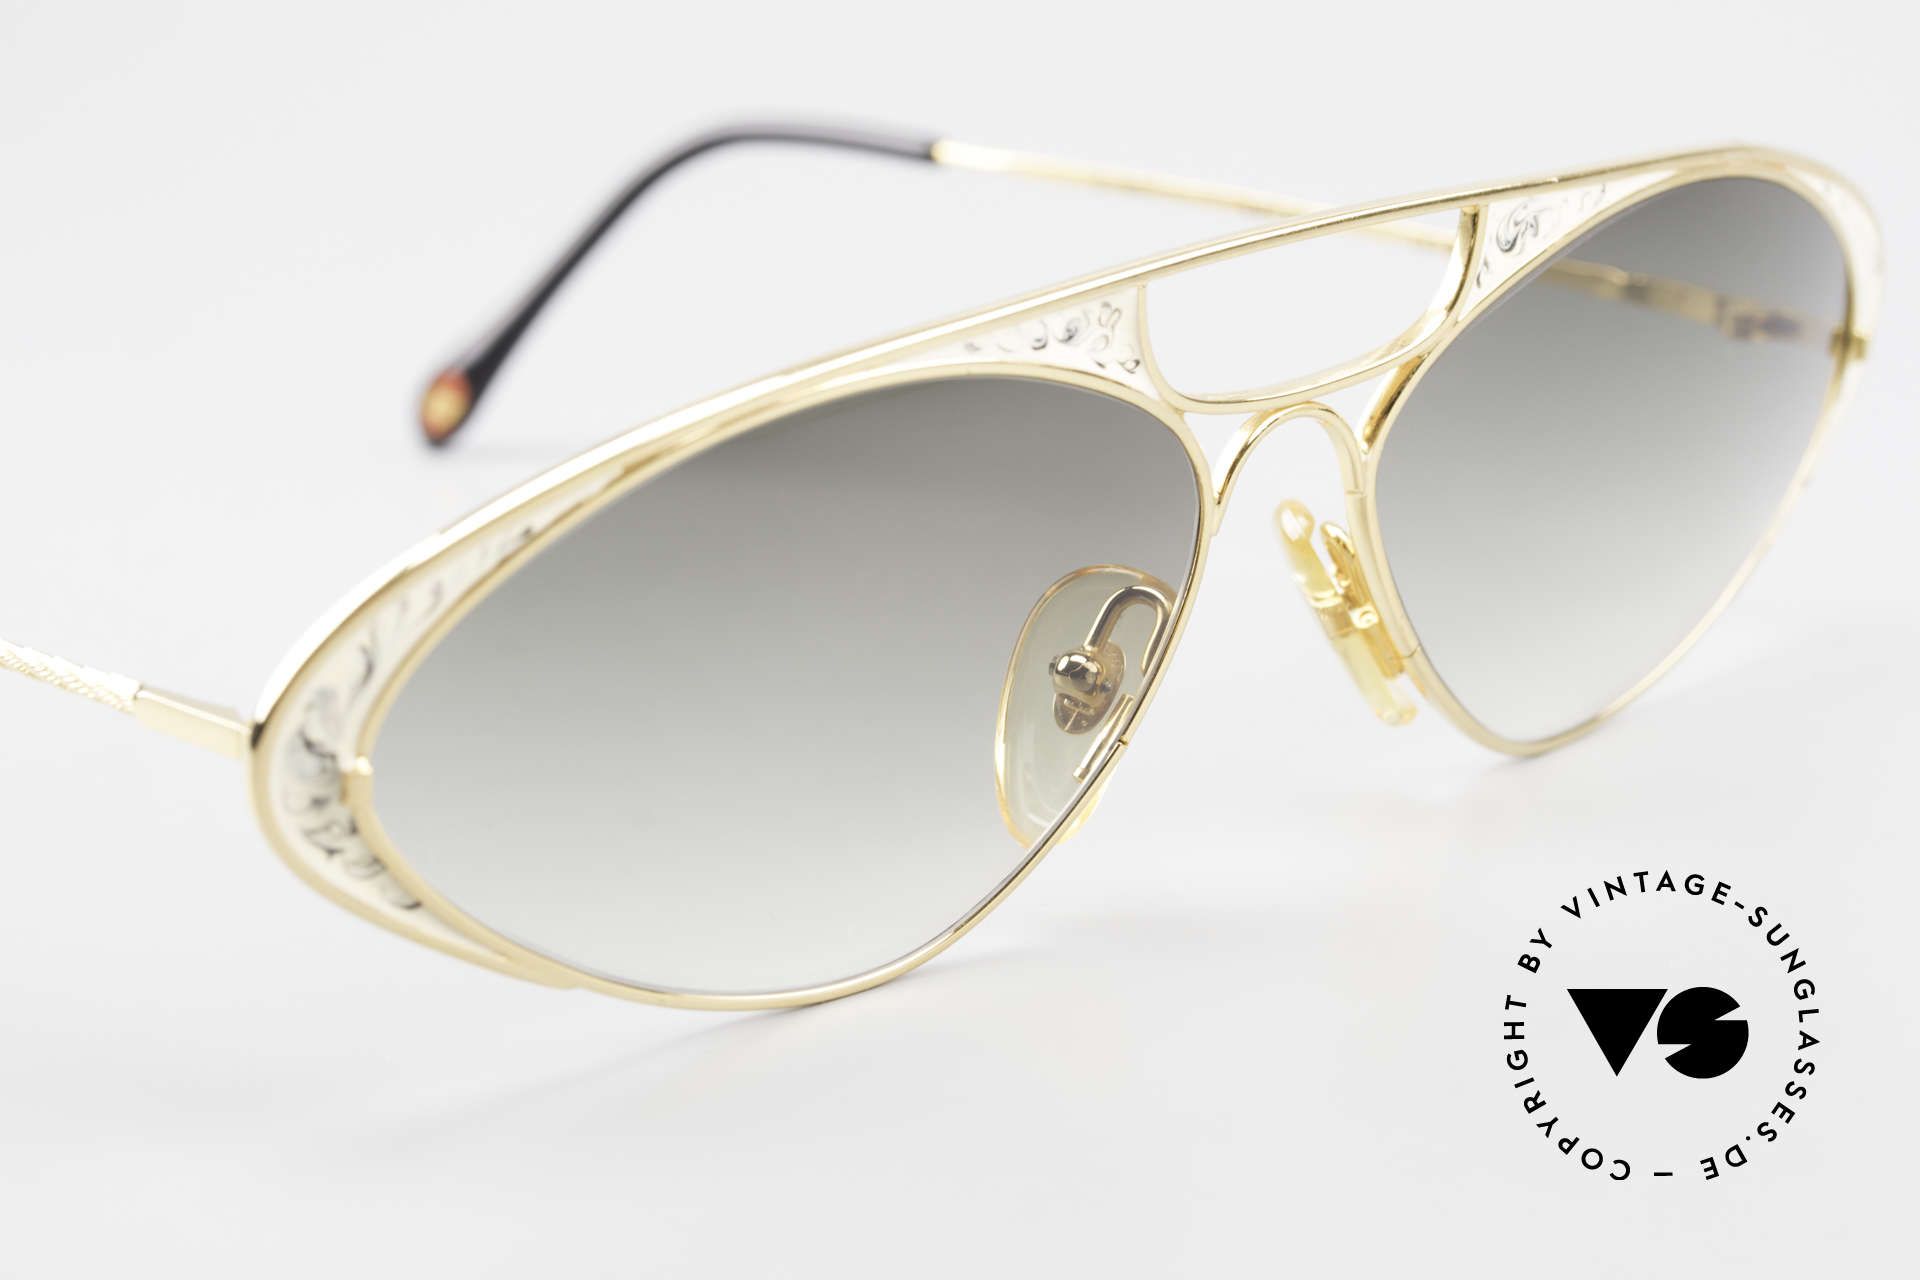 Casanova LC8 Vintage Sunglasses Ladies, NO retro shades, but a unique old designer ORIGINAL, Made for Women